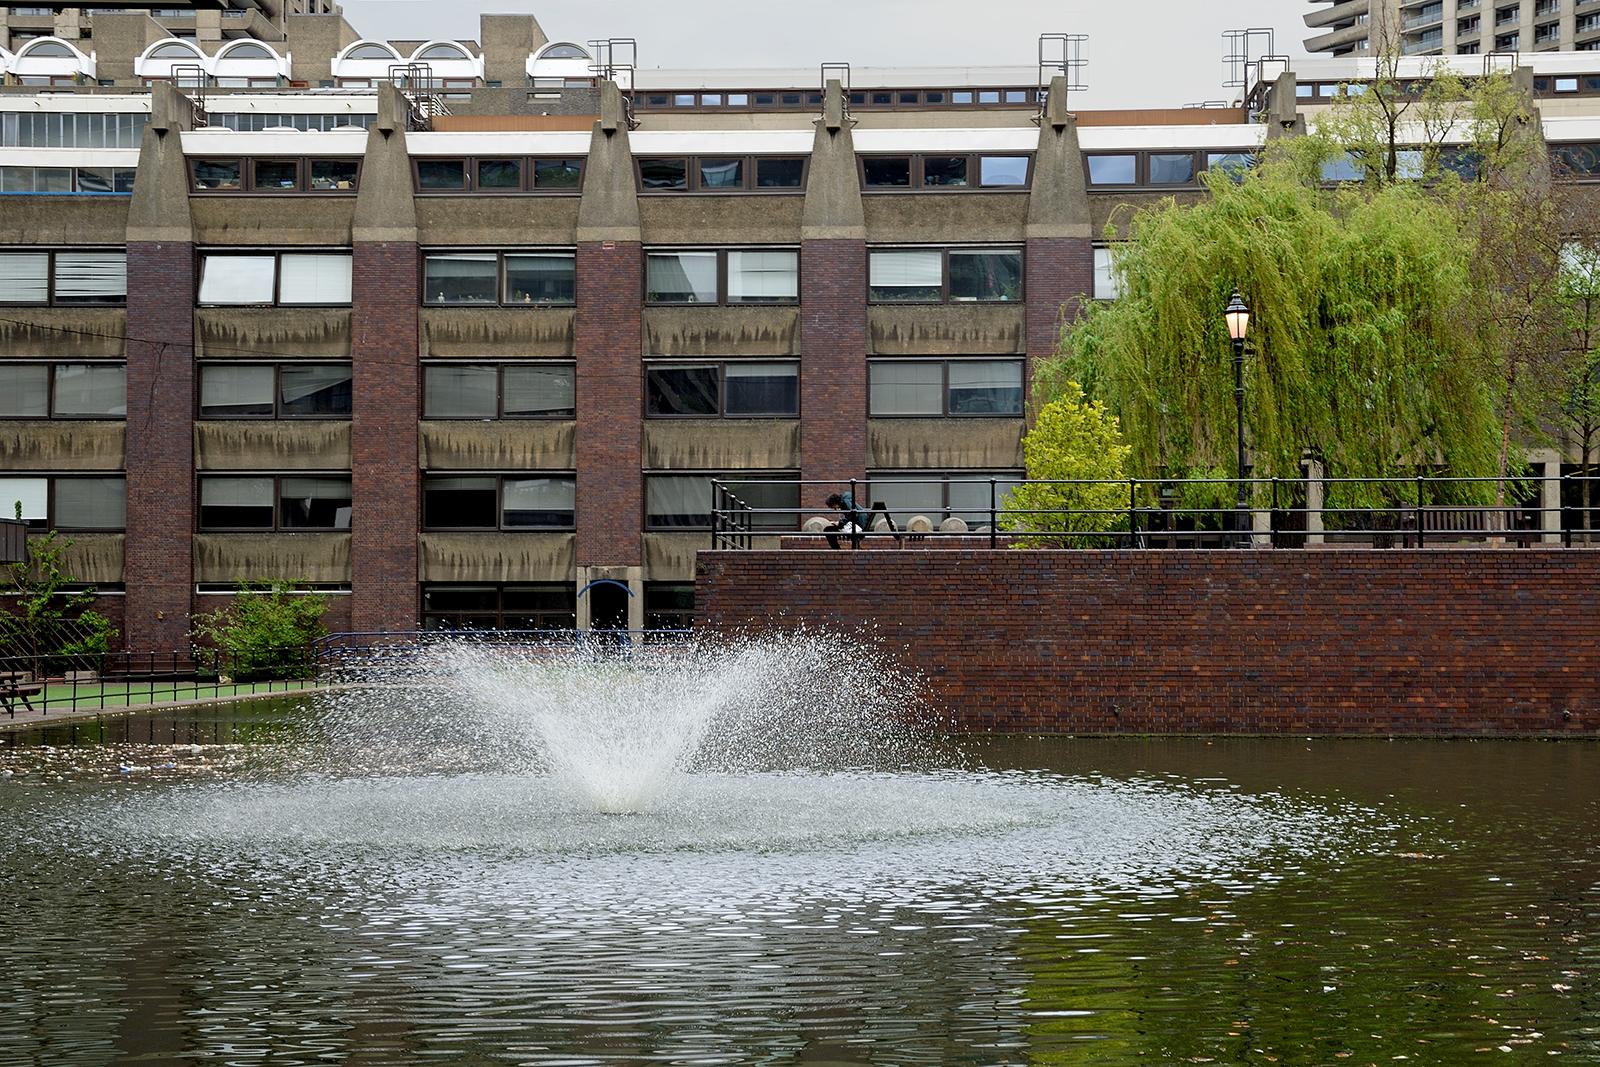 20170416_City-of-London_The-Barbican-Estate_Fountain-in-the-Barbican